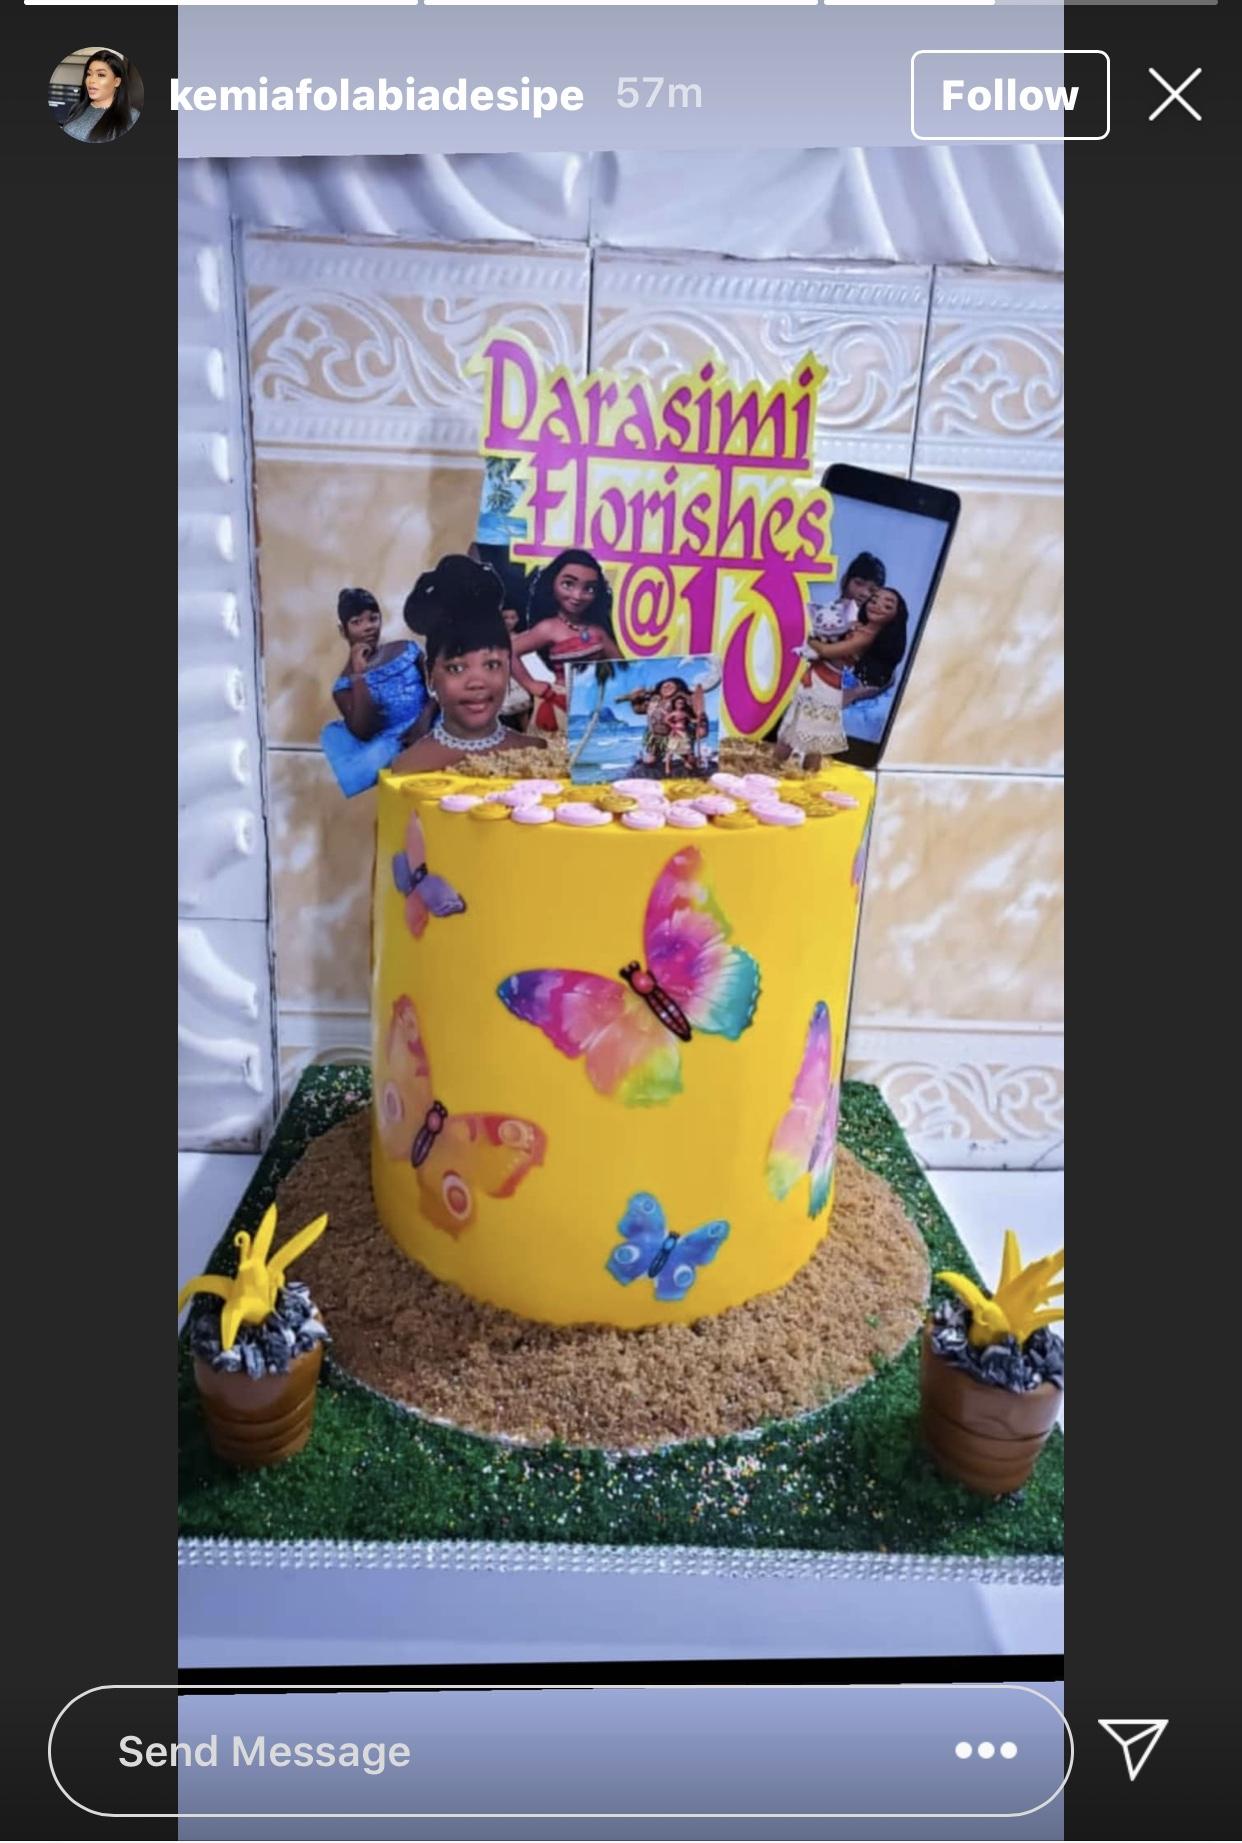 Darasimi's birthday cake